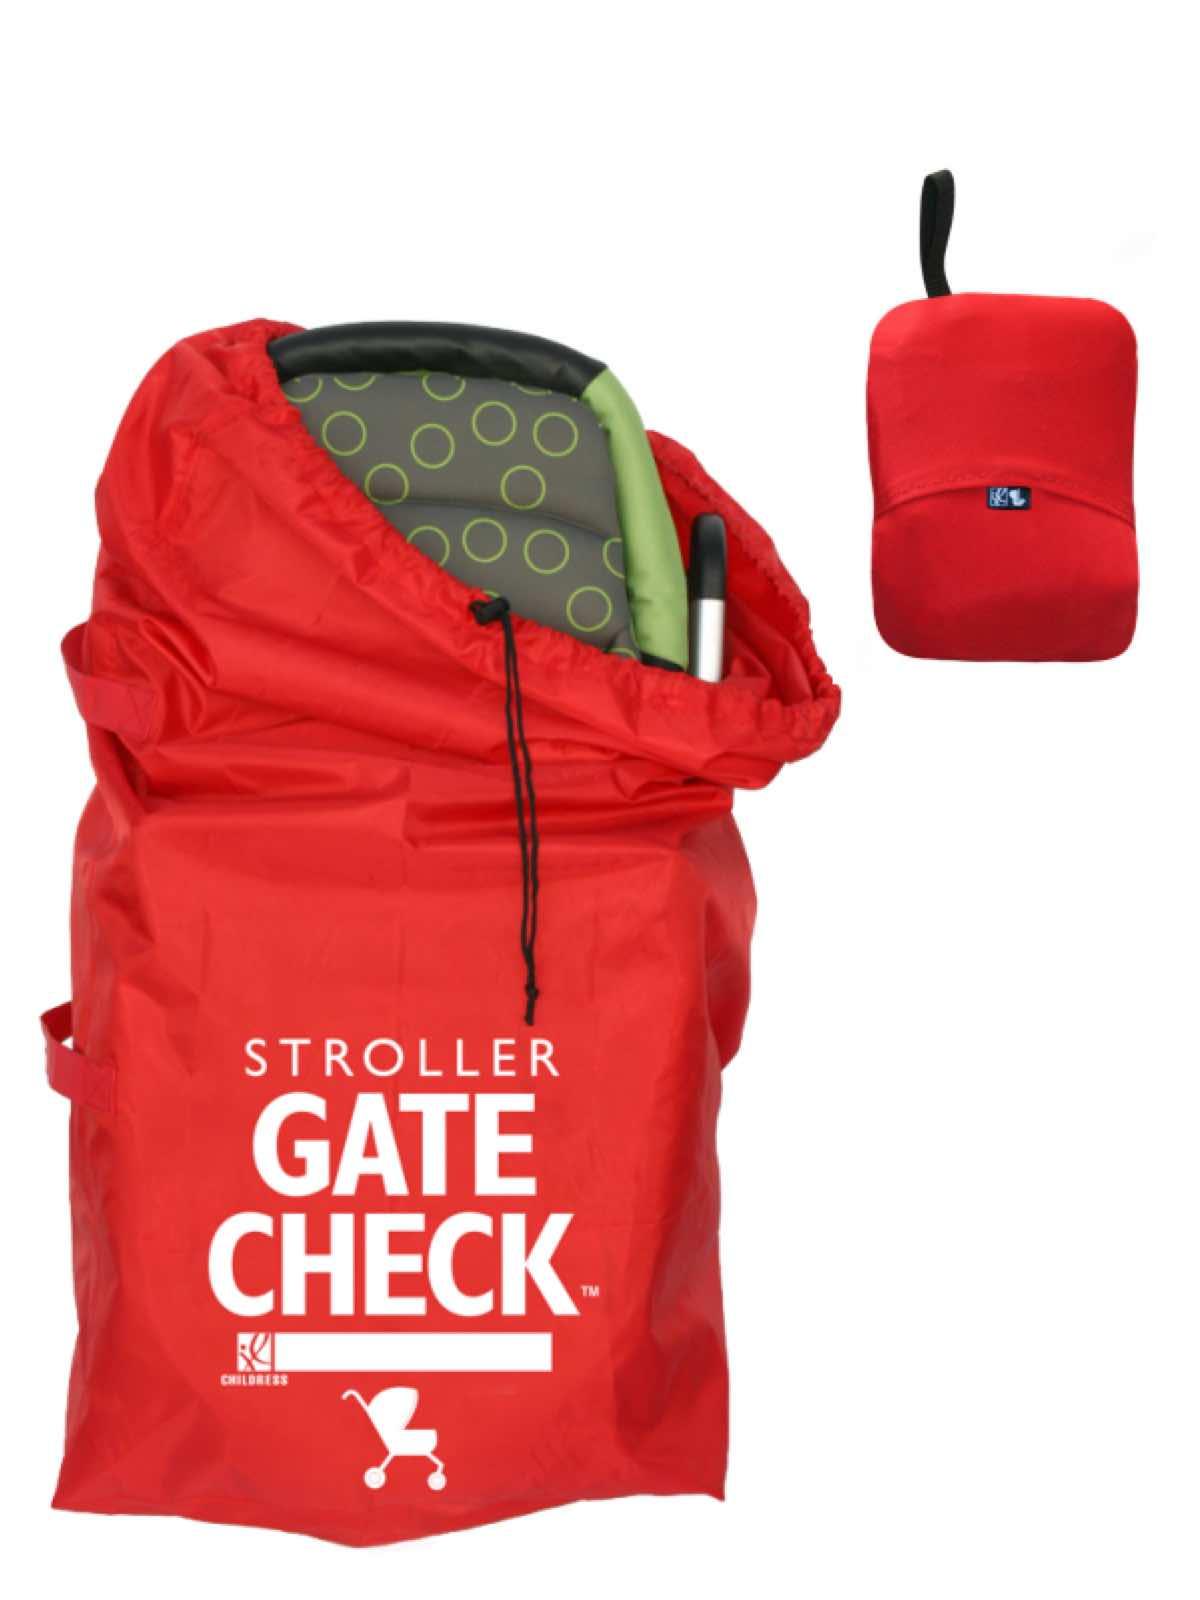 Waterproof Travel Gate Check Pram Umbrella Stroller Buggy Protection Cover Bag